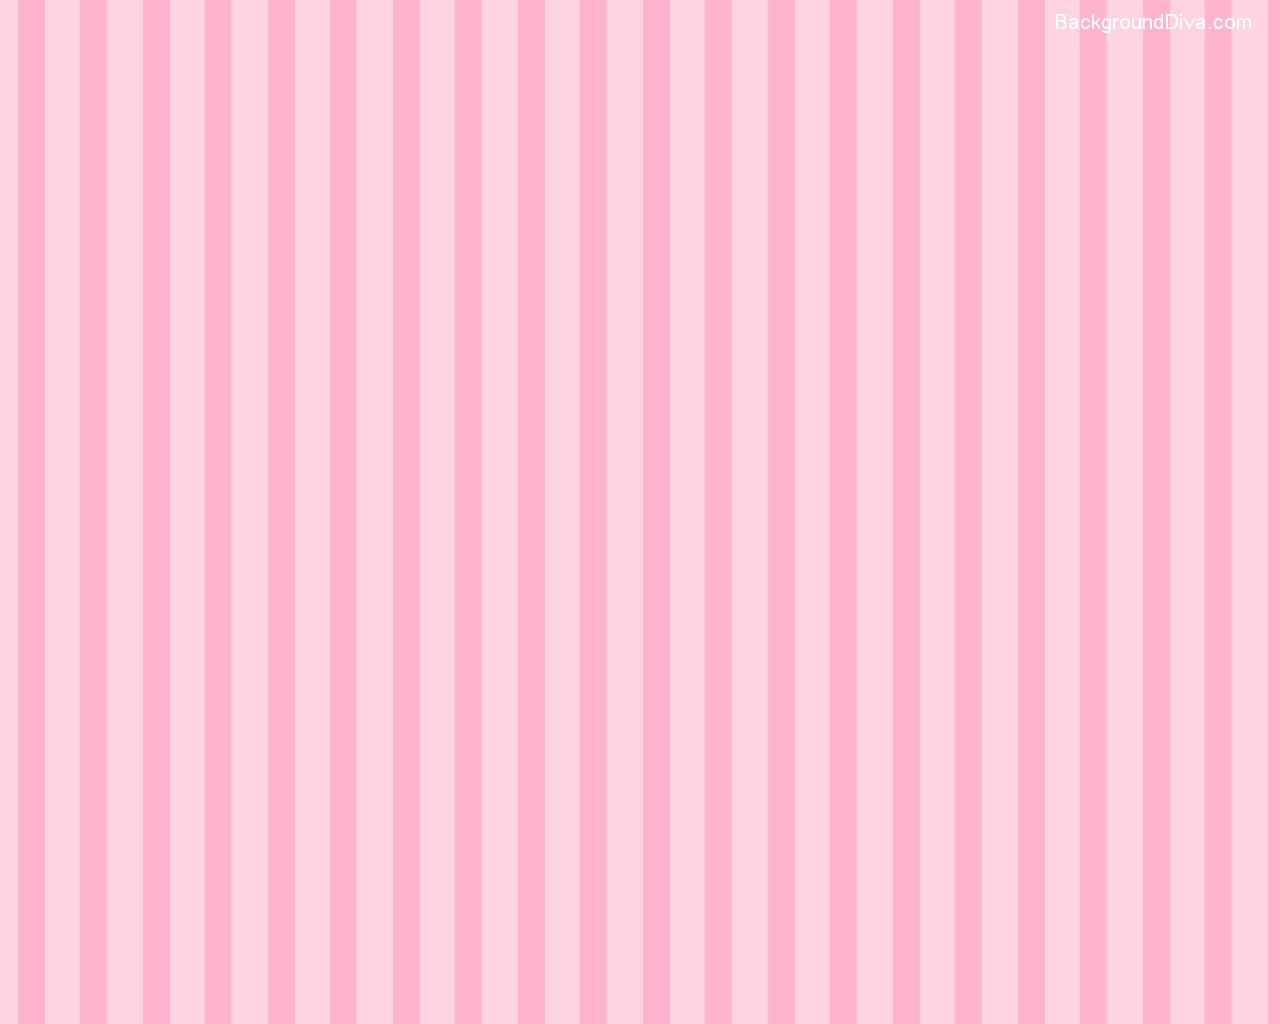 Pink Pattern Wallpaper | Love Wallpaper | Pinterest | Pink ...